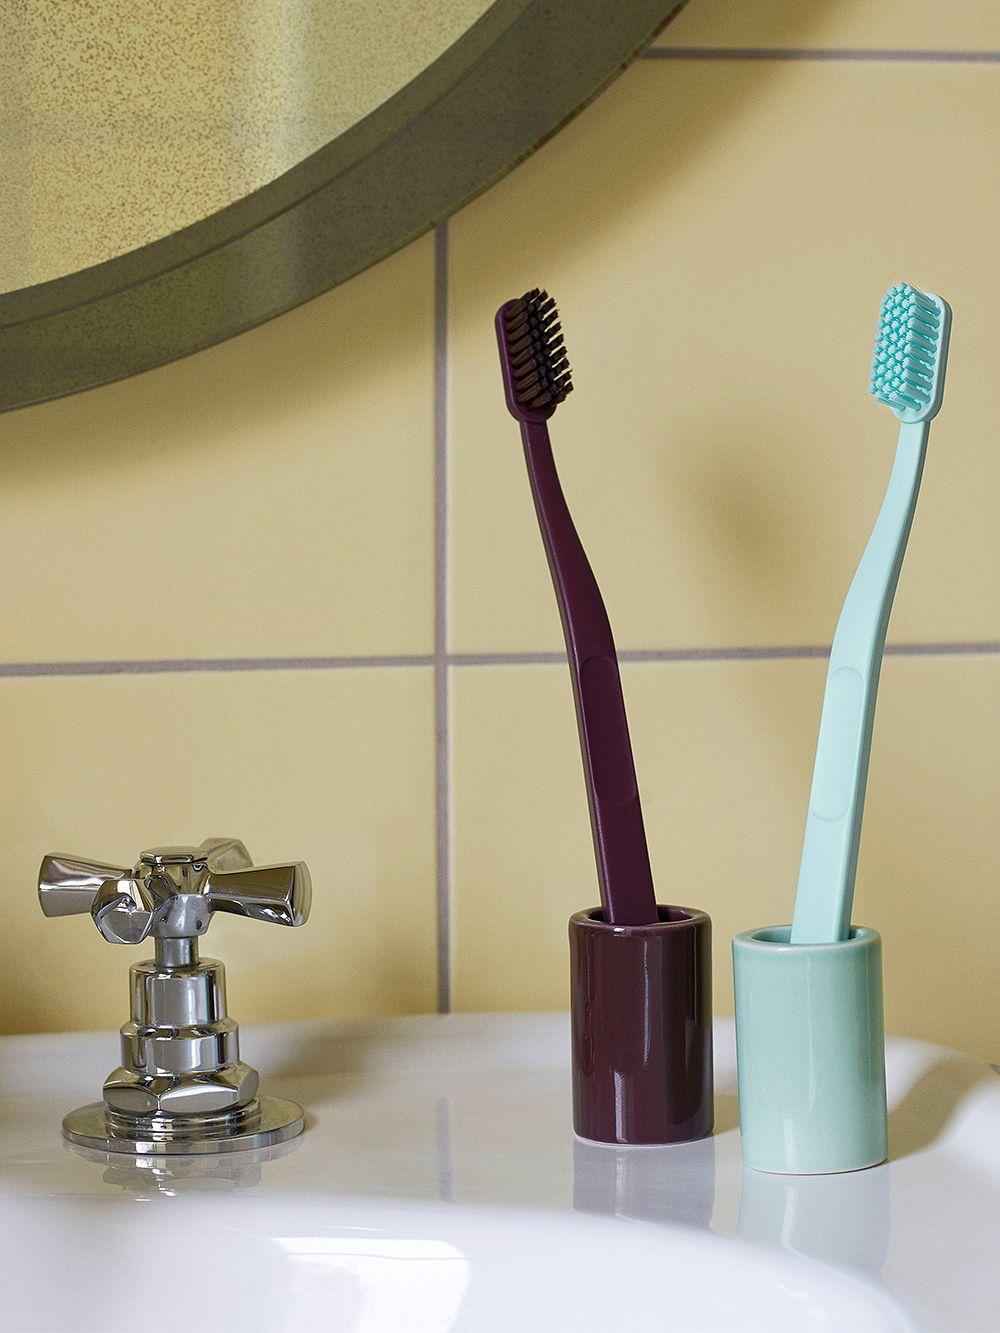 Hay Tann toothbrush, mint